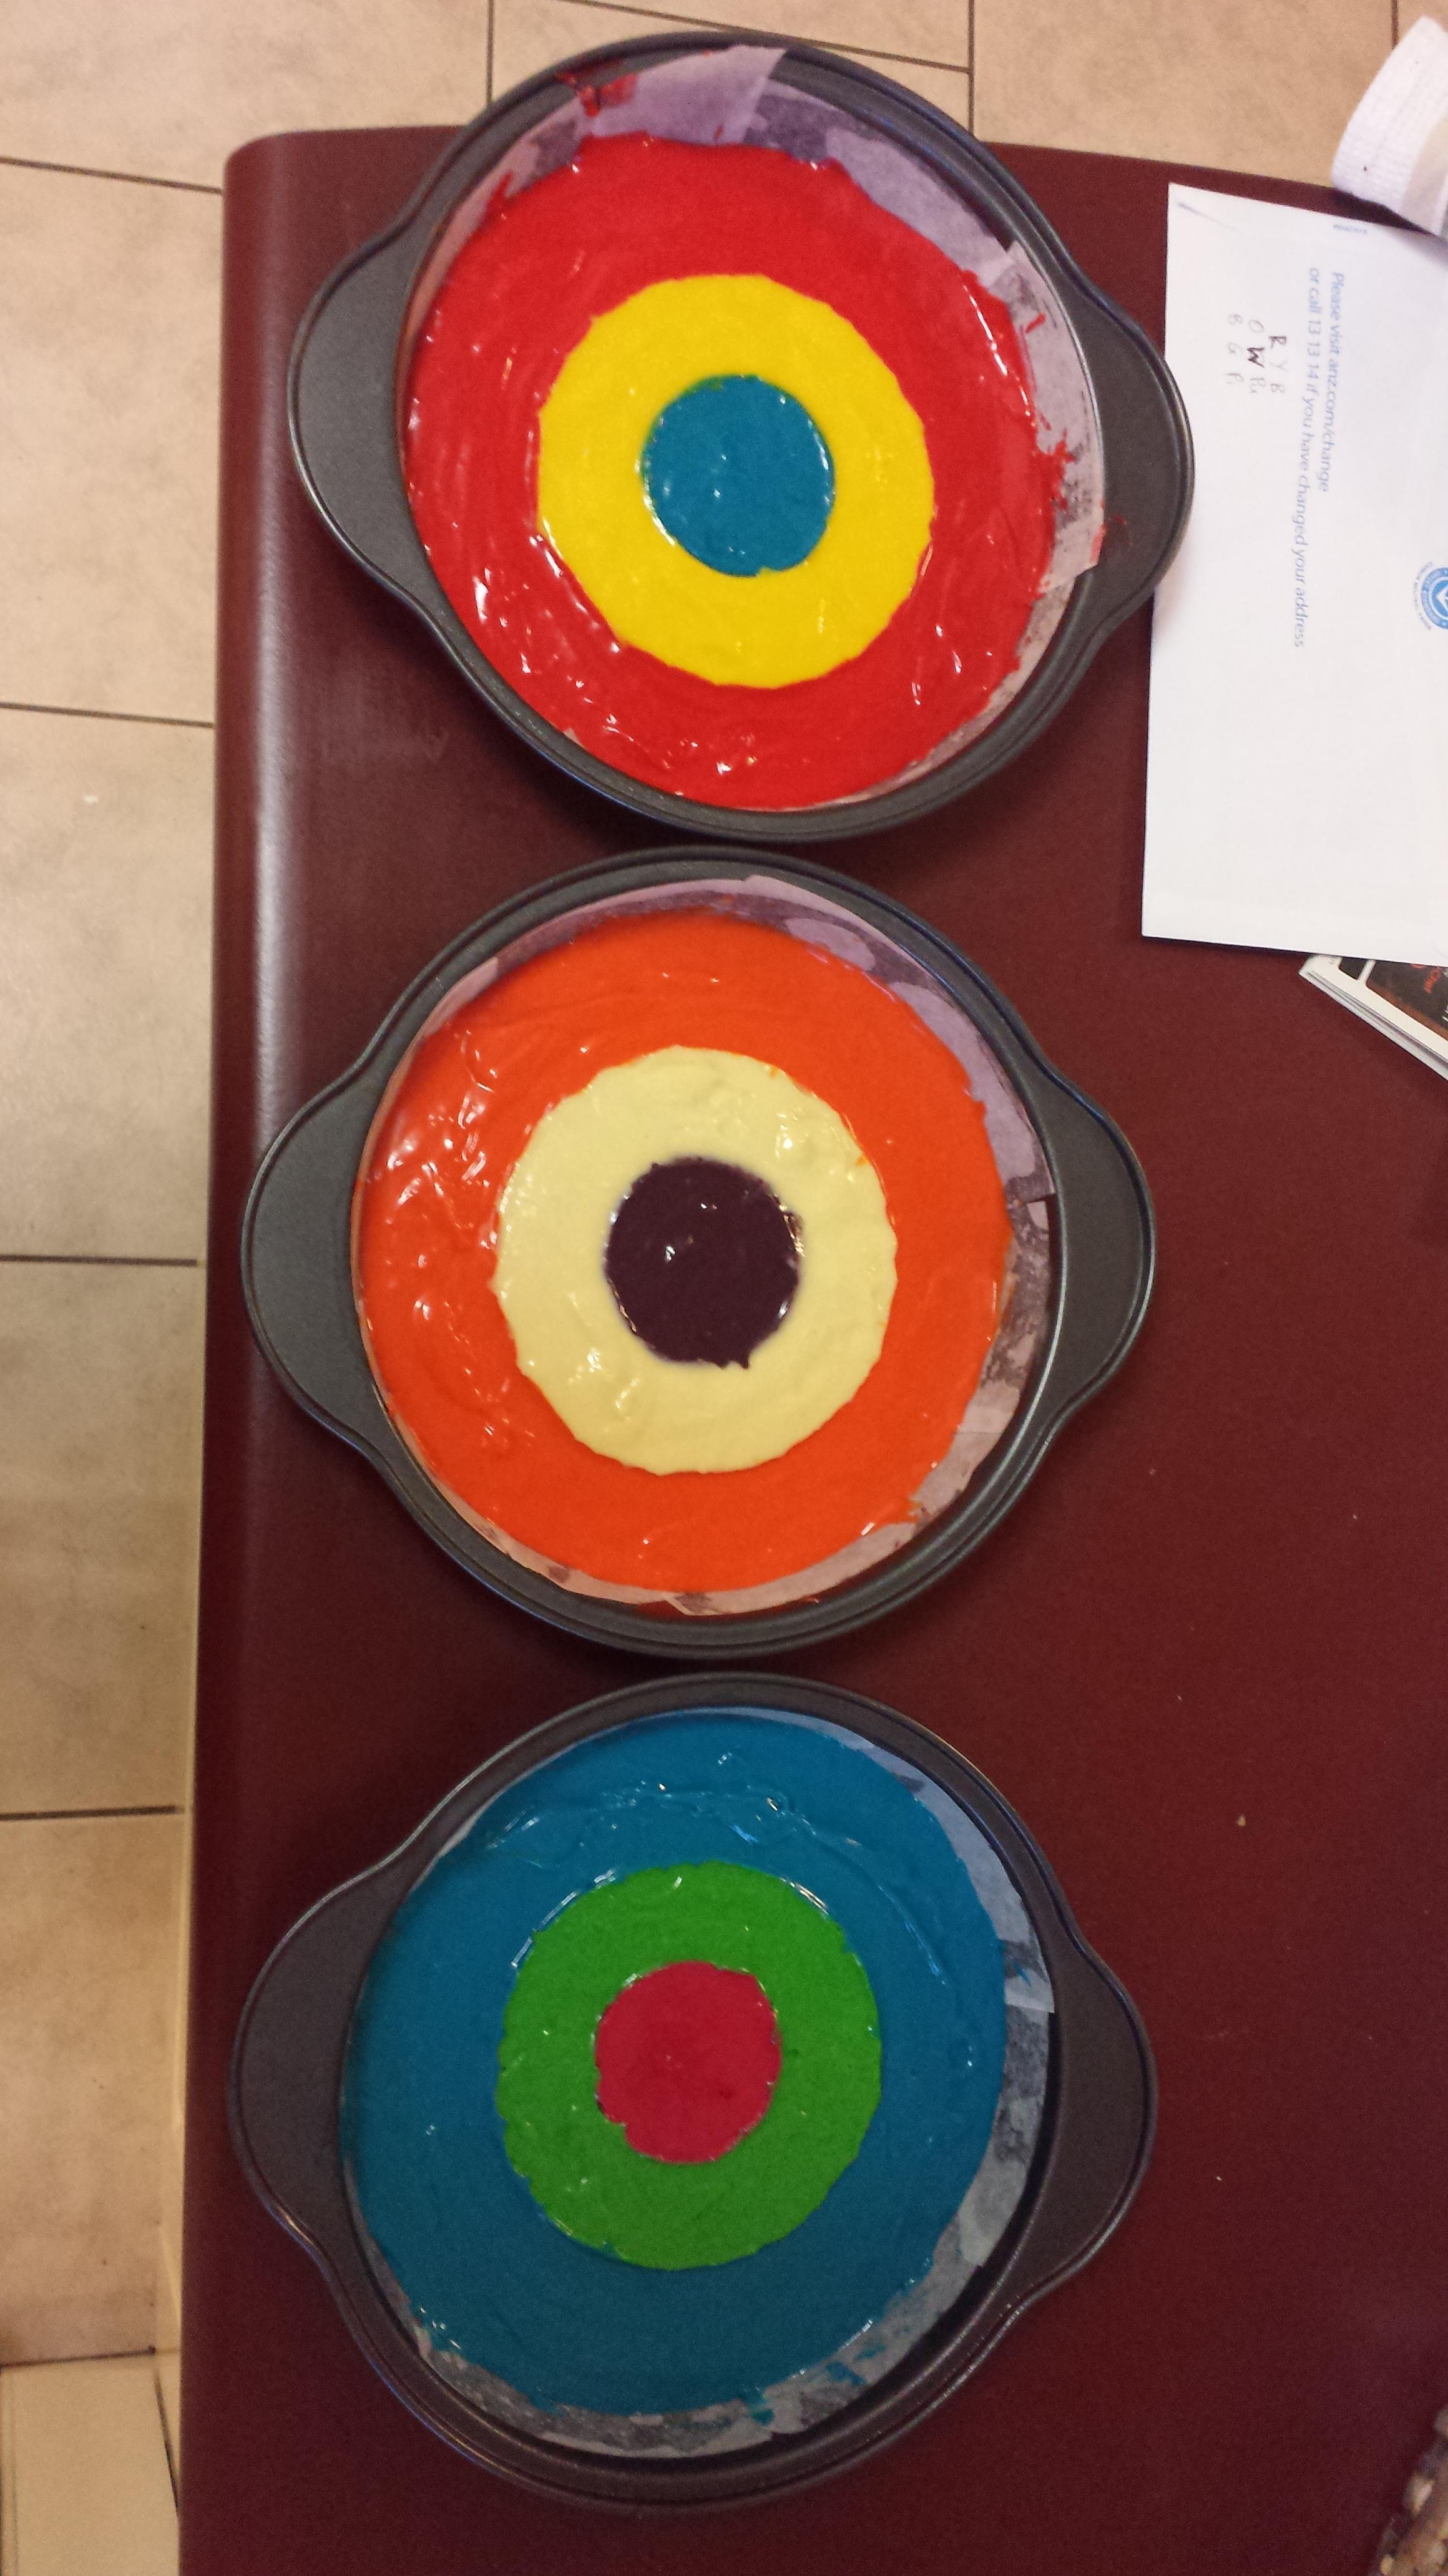 Cake batter pans